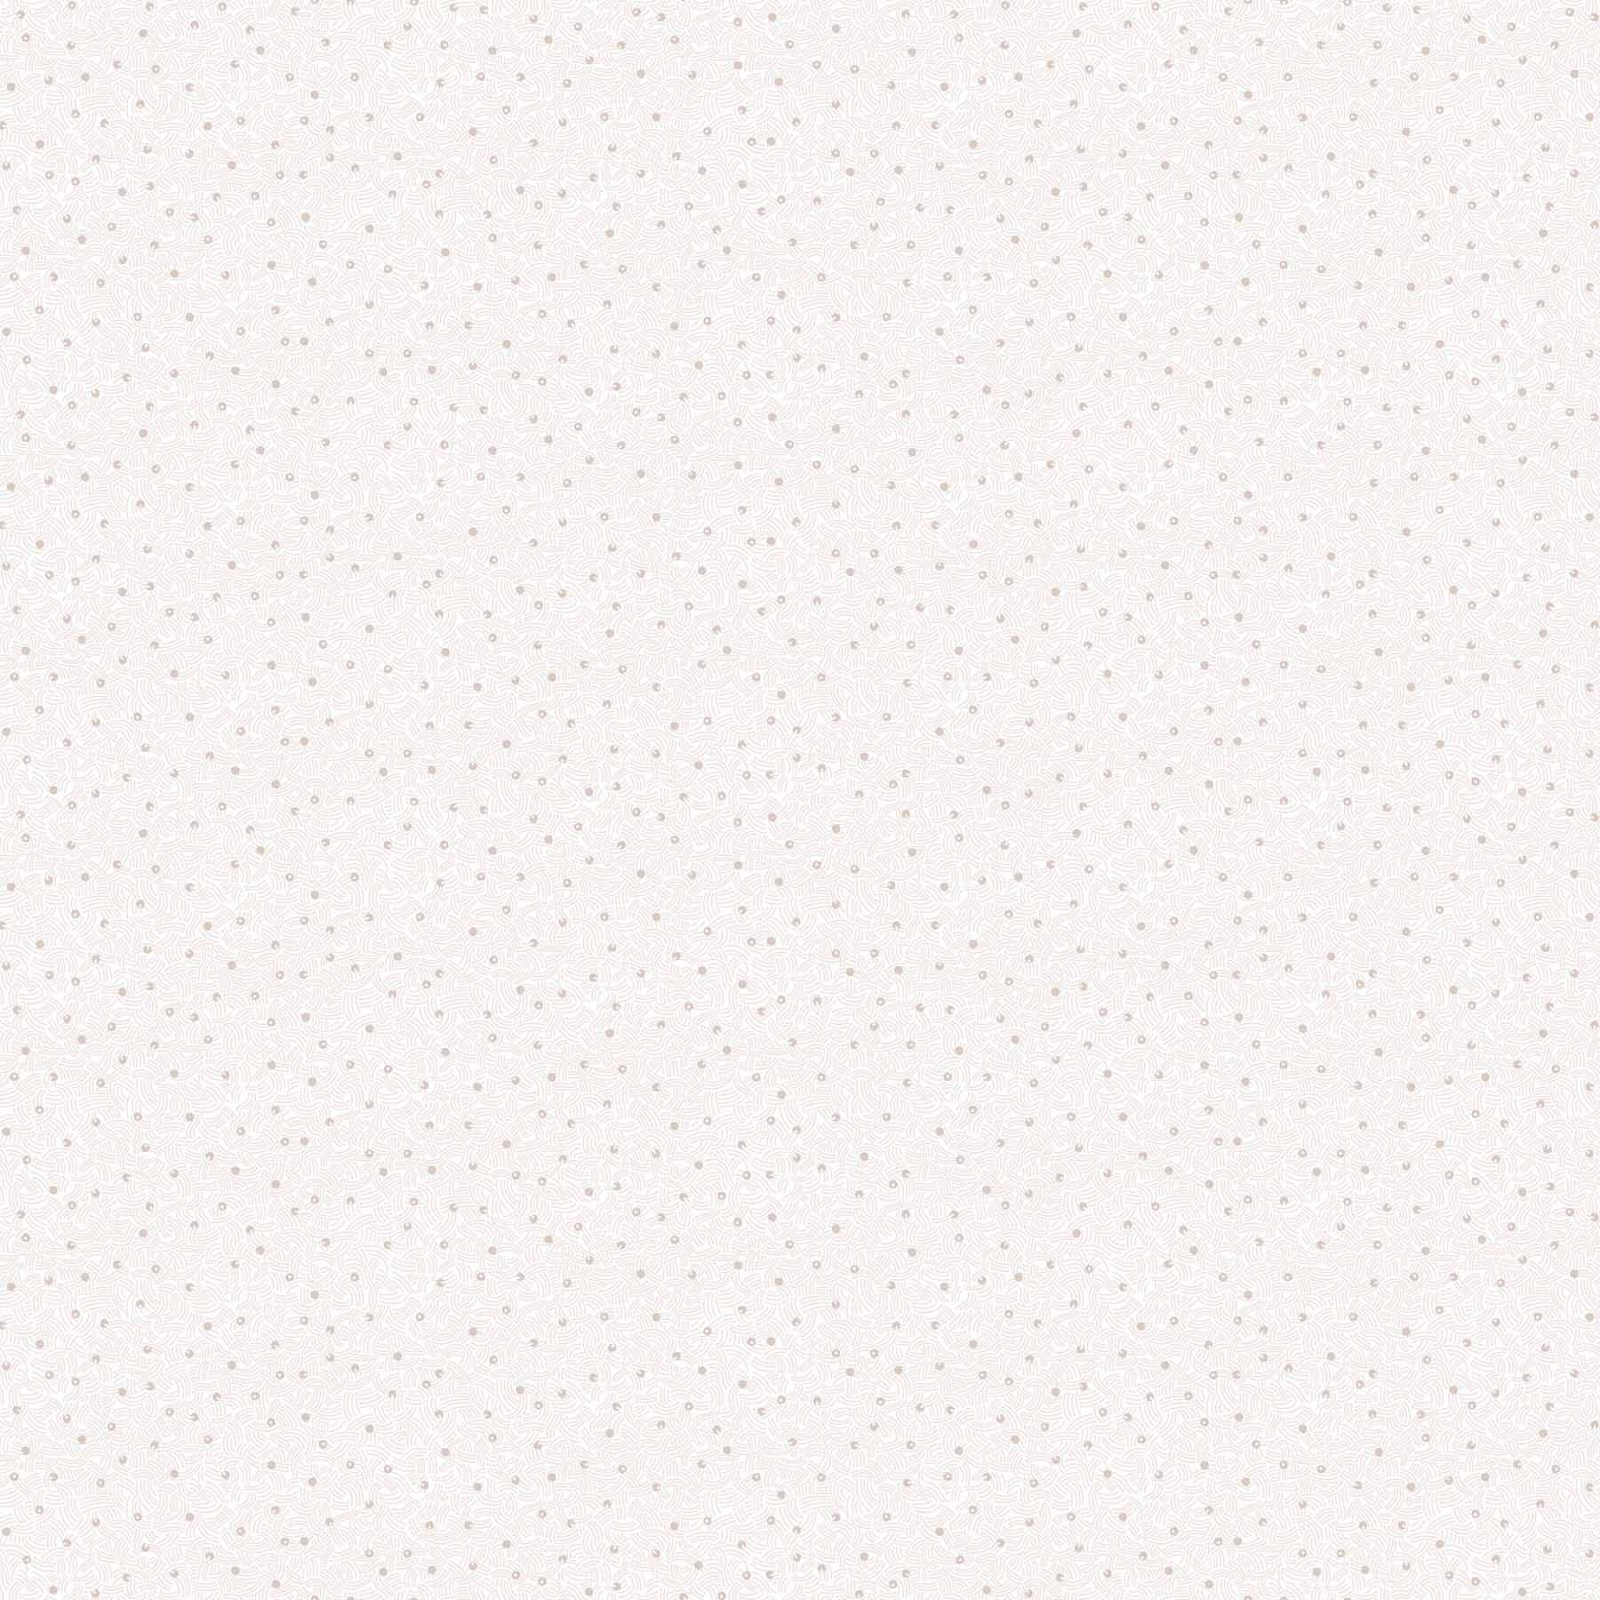 Figo Elements - Scratch White